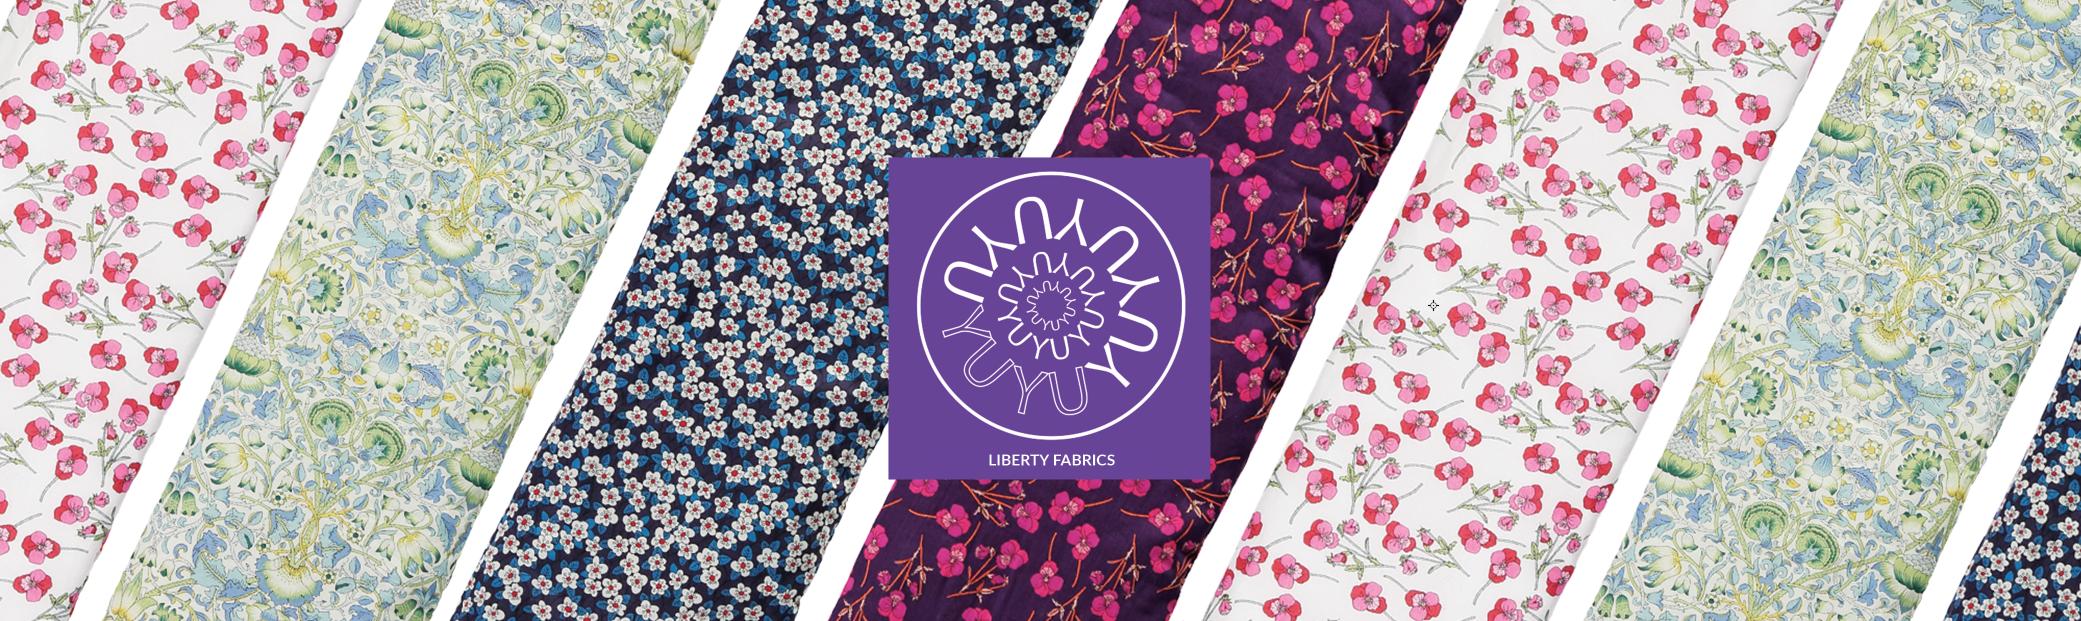 YuYus Liberty Fabrics Collection